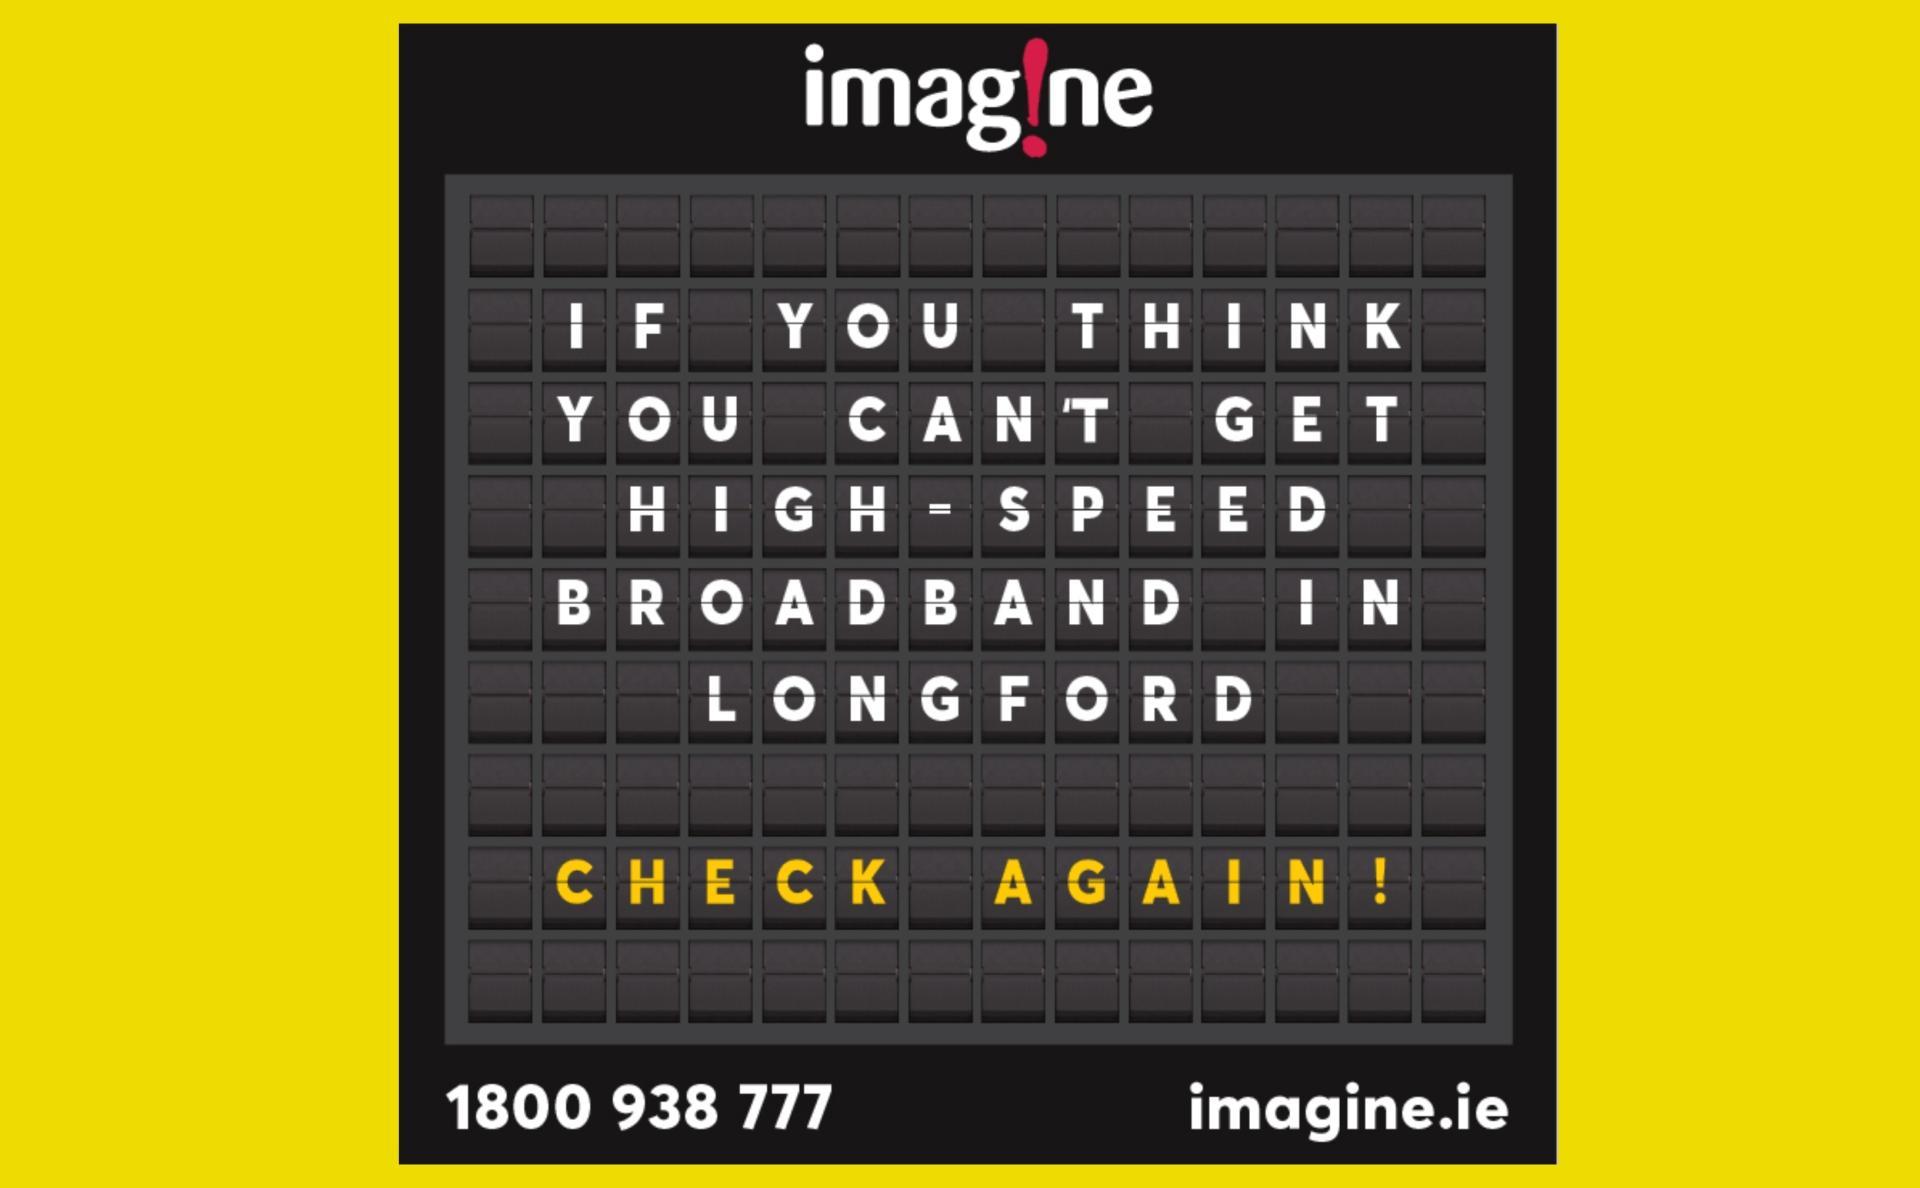 Longford speed dating - Find date in Longford, Ireland